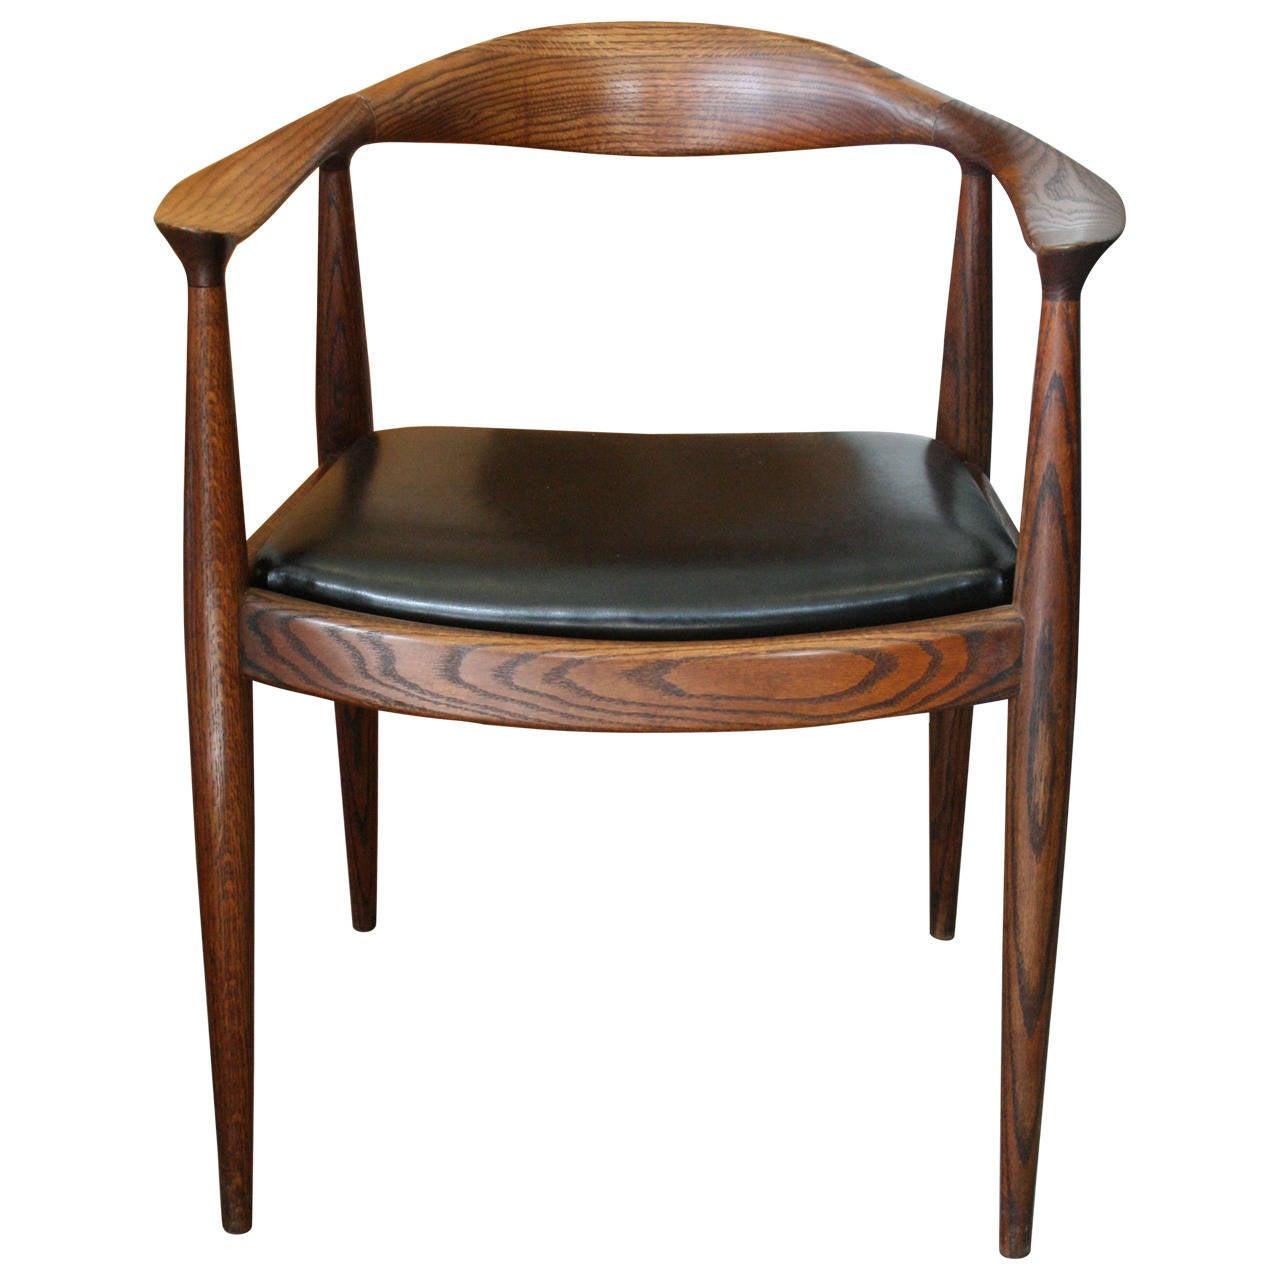 Oak round chair in the style of hans wegner at 1stdibs - Hans wegner style chair ...